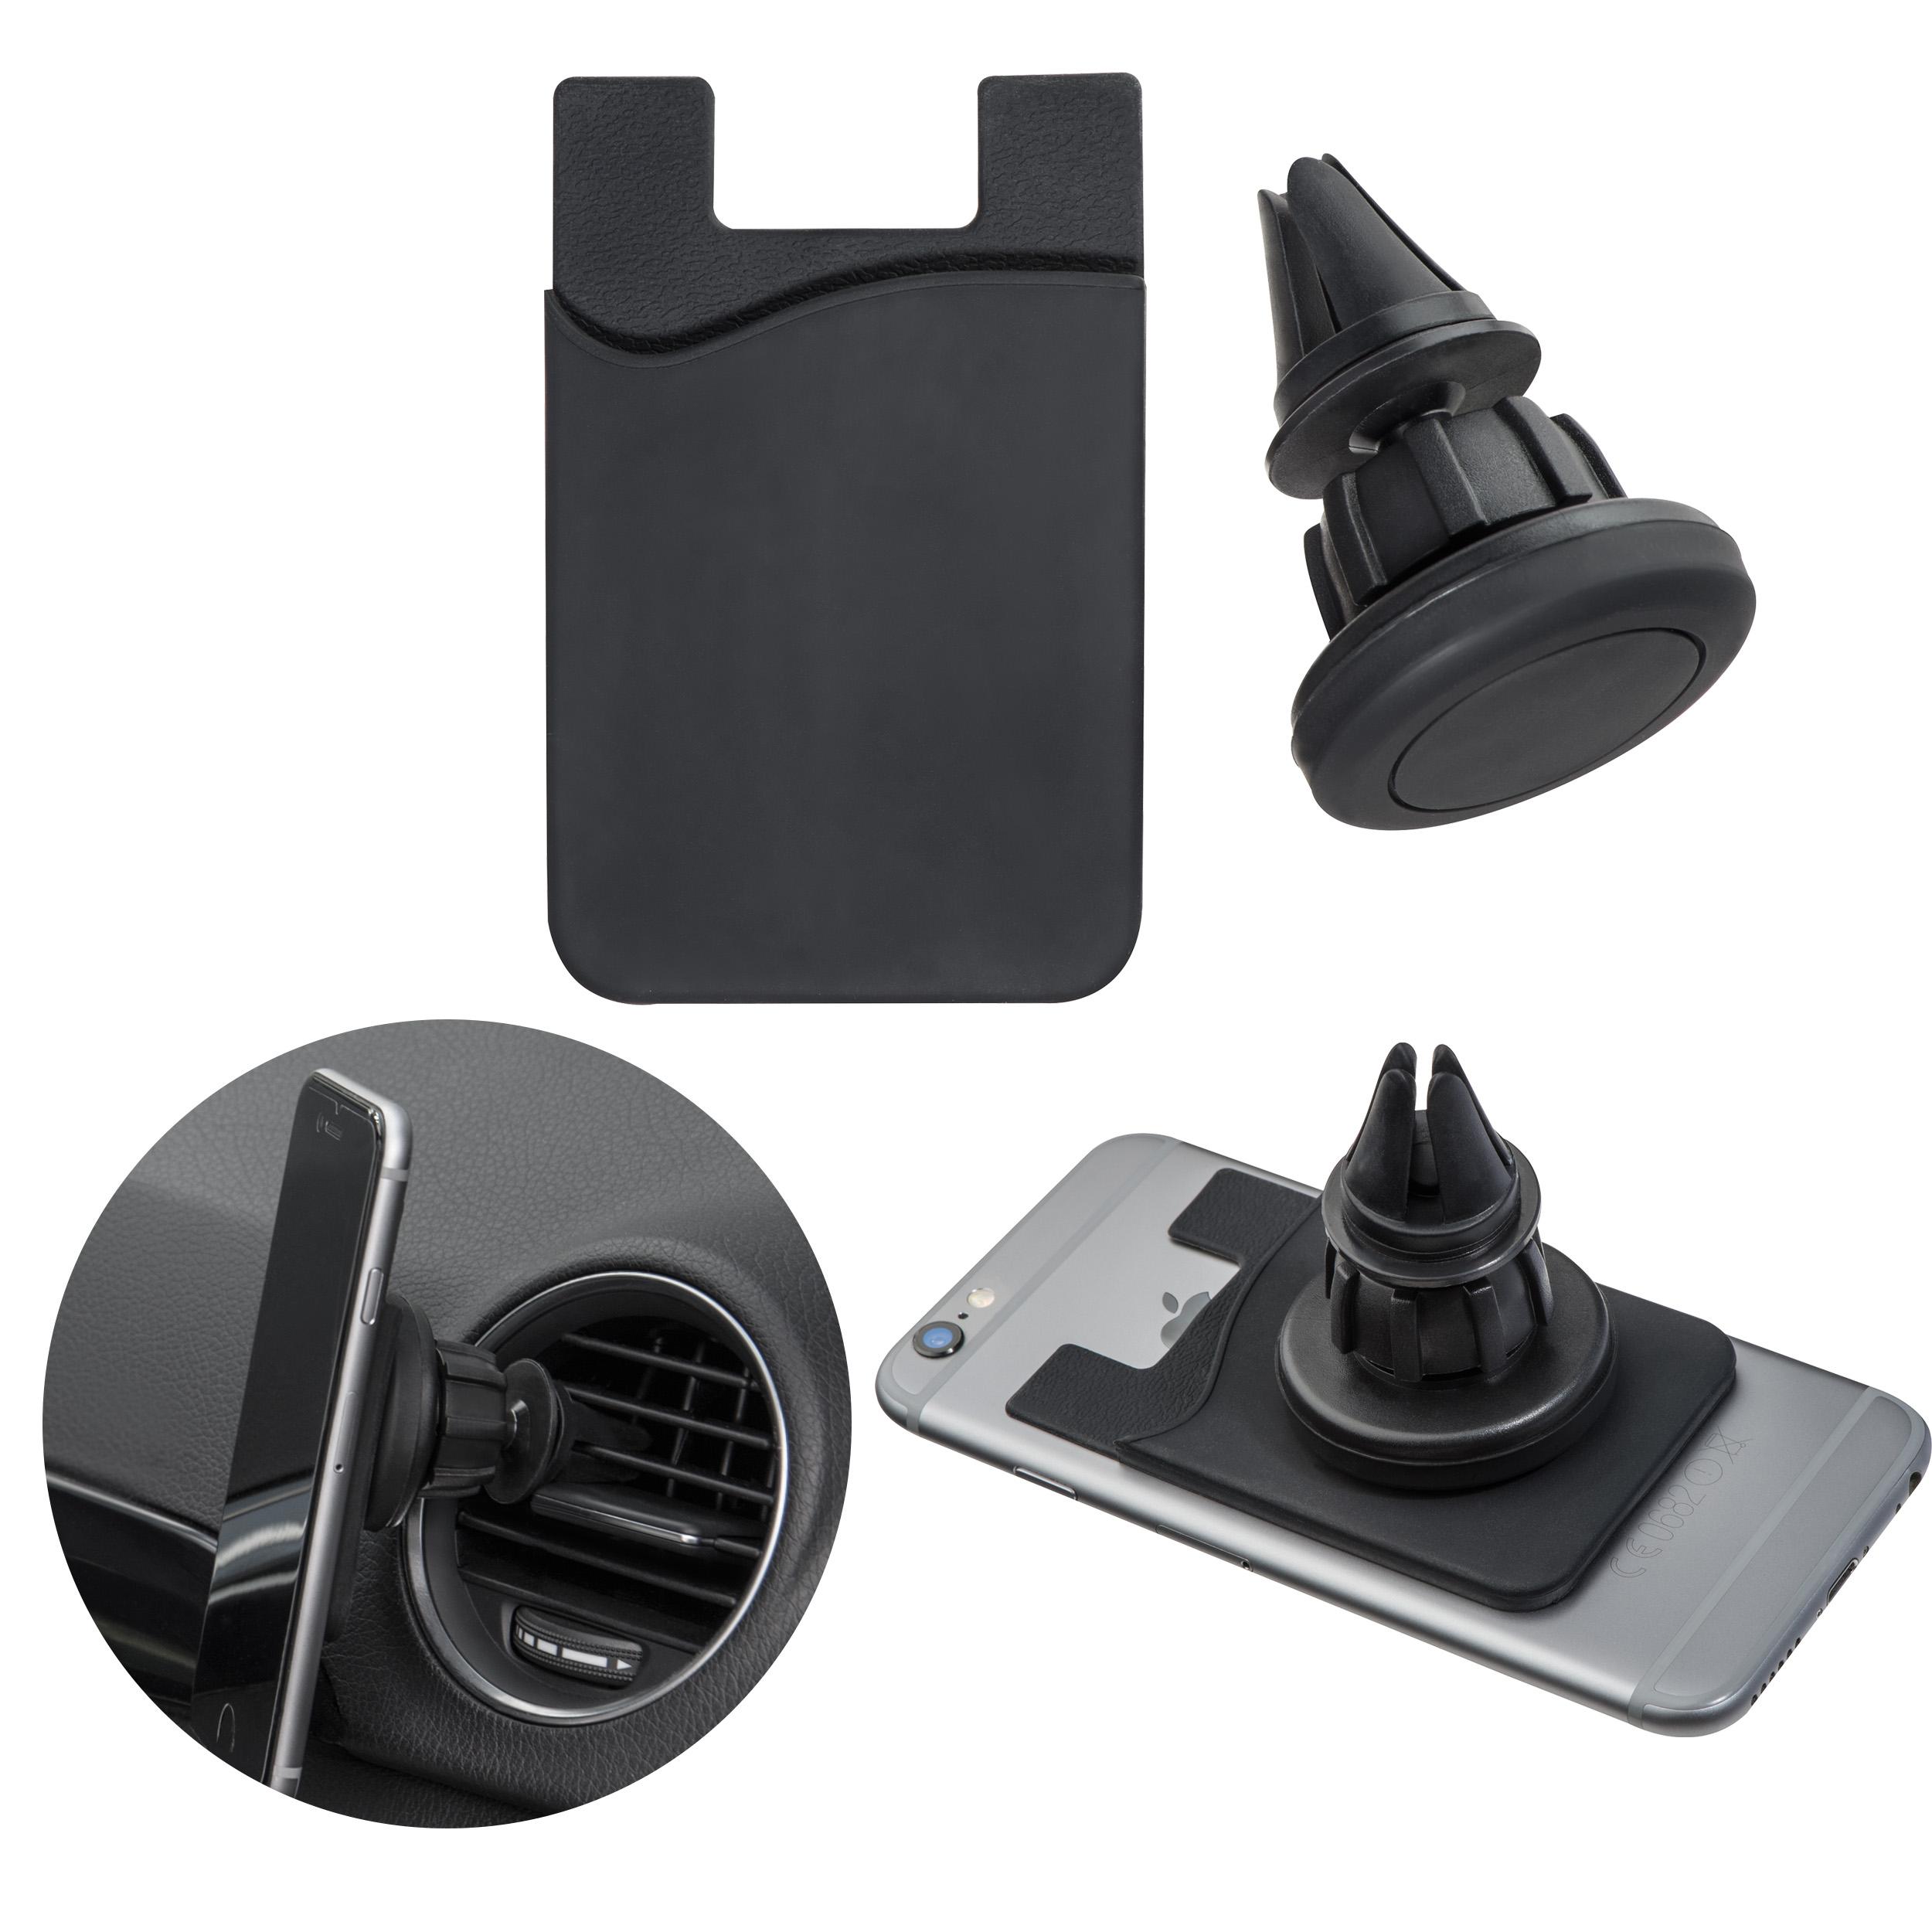 Support-portable pour voiture